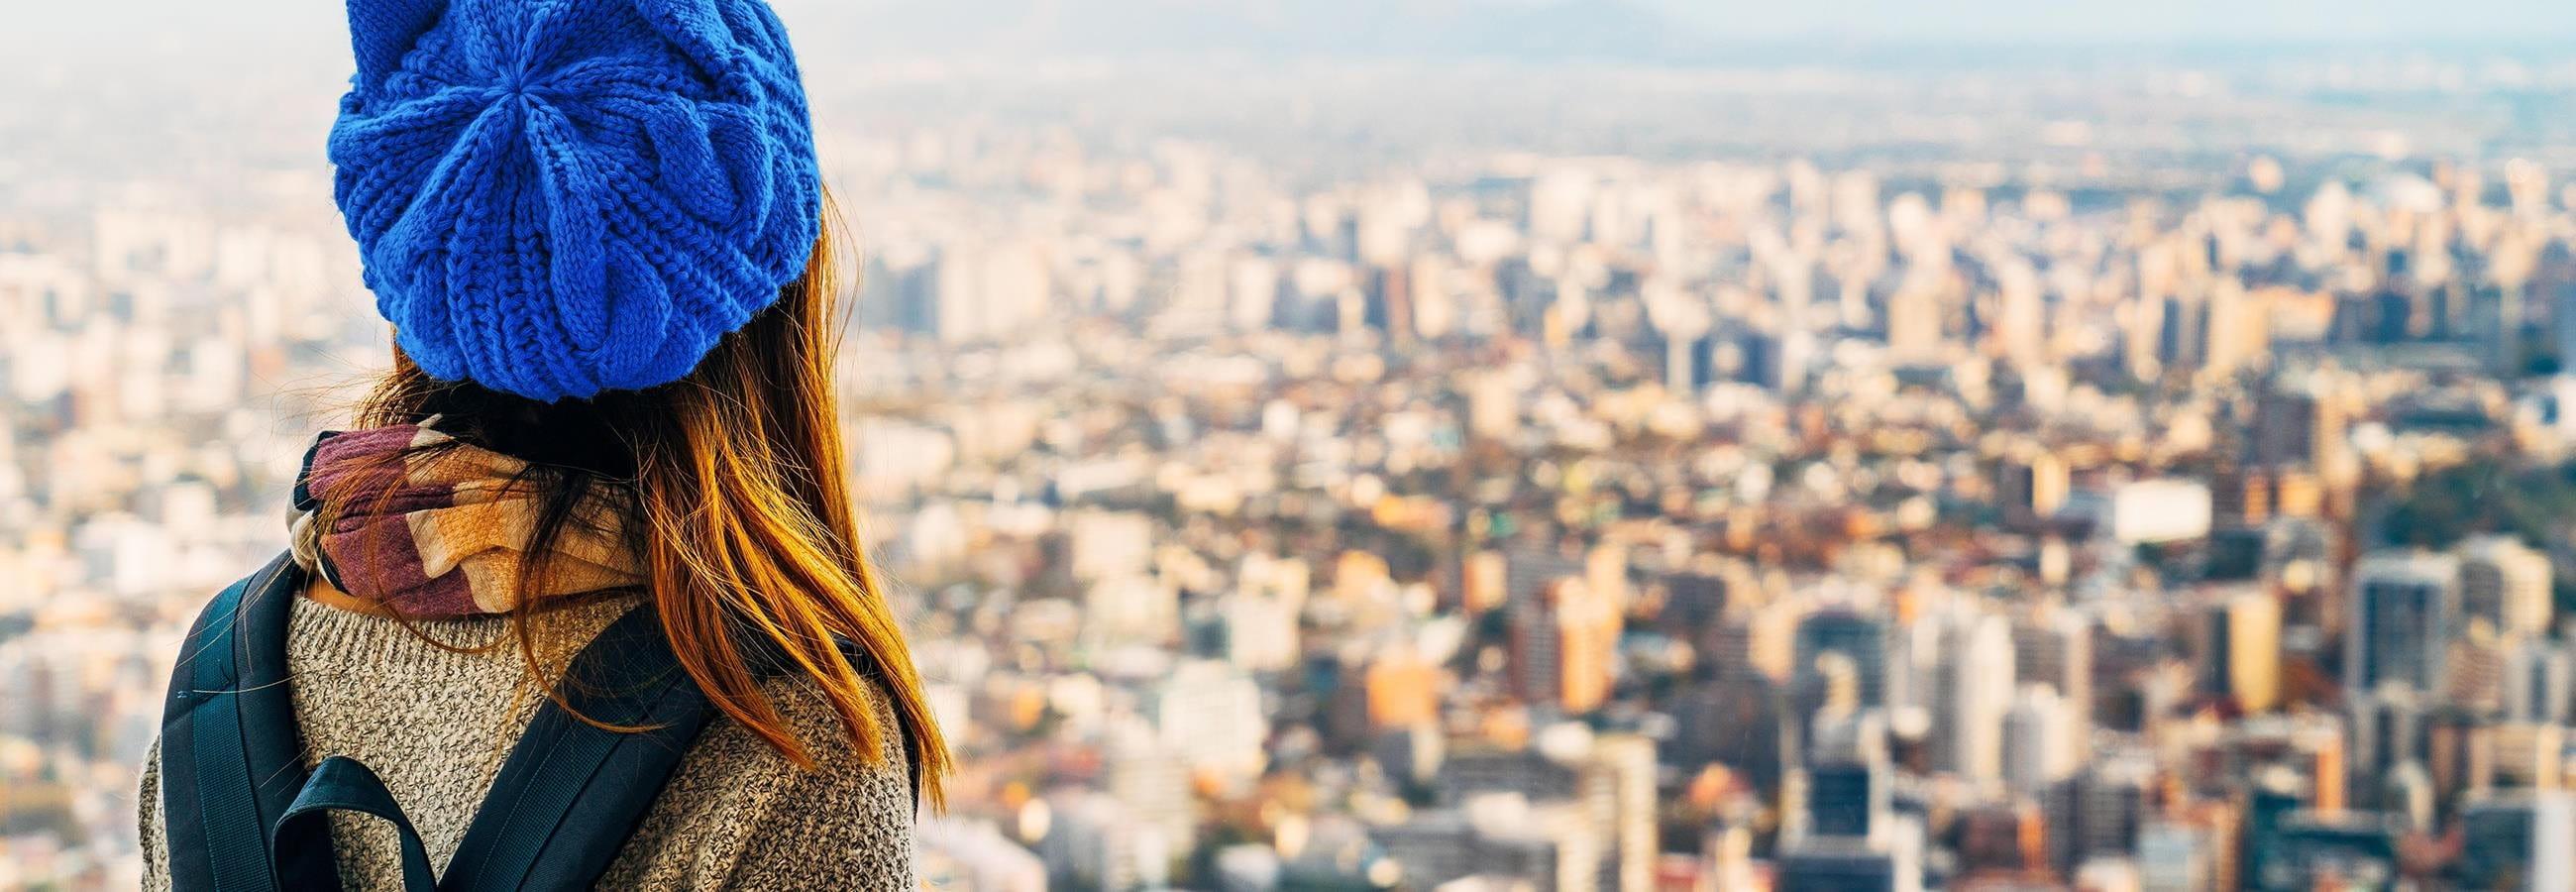 Femme regarde une ville